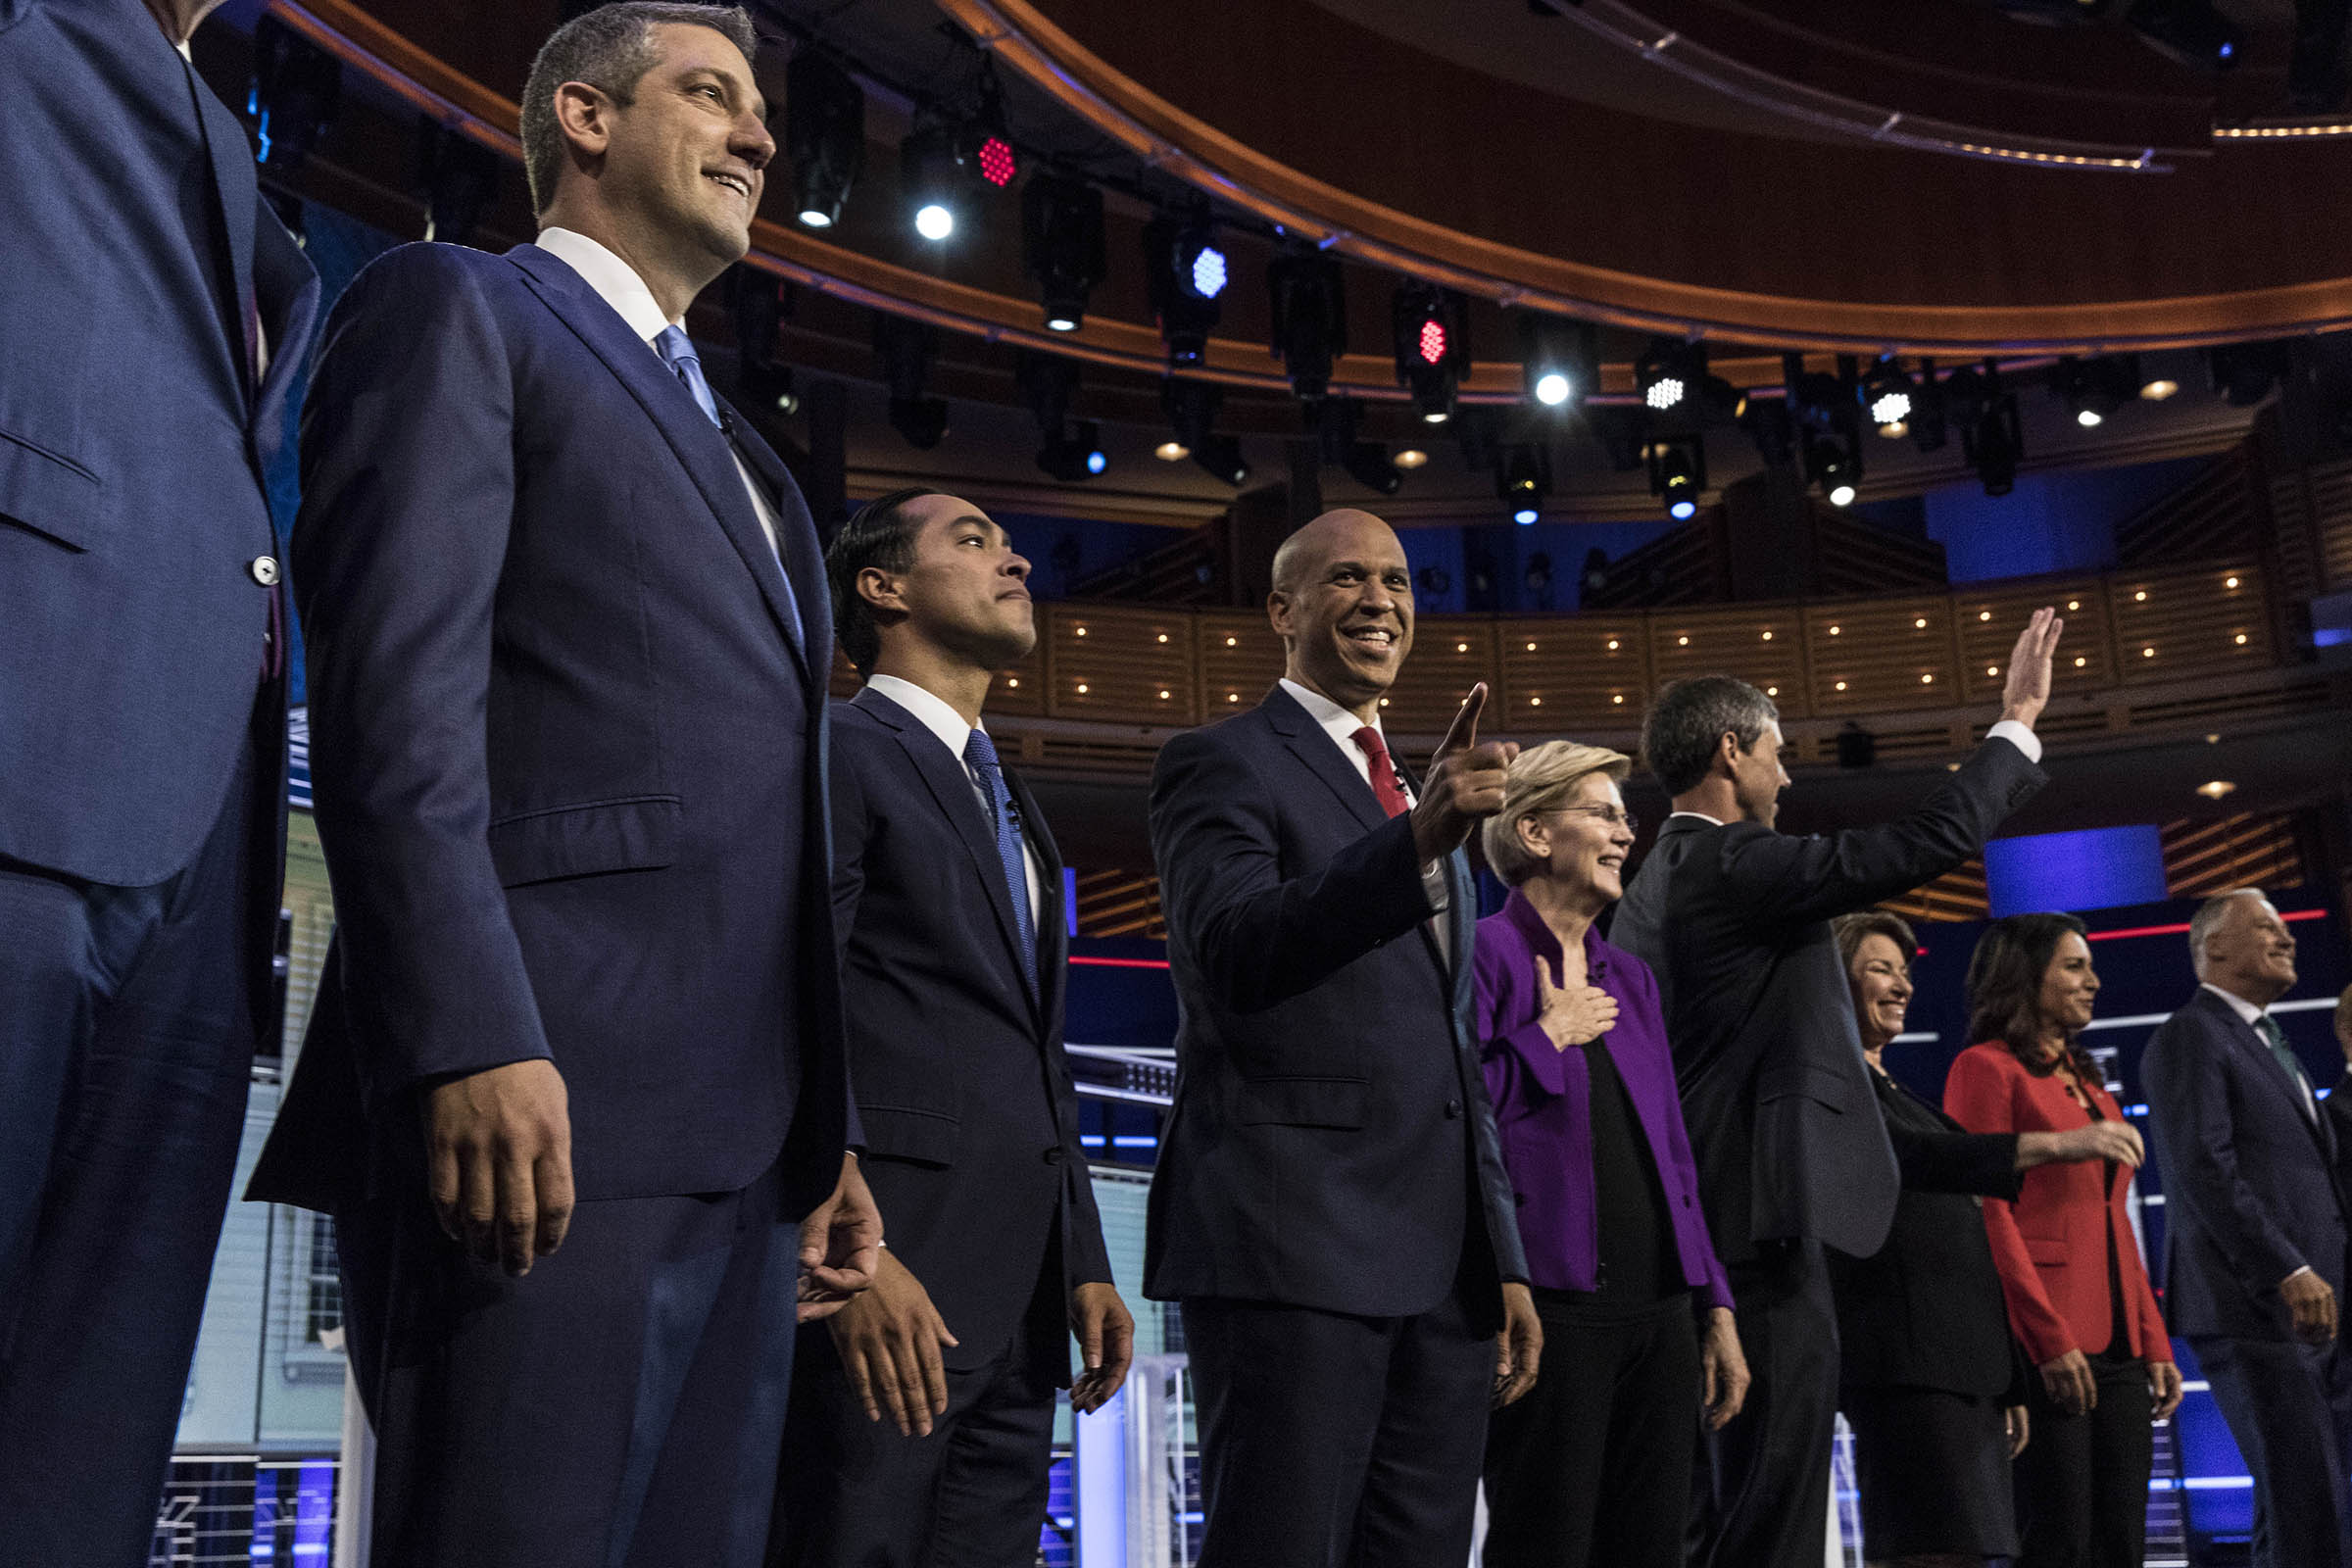 Democratic presidential candidates New York City Mayor Bill De Blasio (L-R), Rep. Tim Ryan (D-OH), former housing secretary Julian Castro, Sen. Cory Booker (D-NJ), Sen. Elizabeth Warren (D-MA), former Texas congressman Beto O'Rourke, Sen. Amy Klobuchar (D-MN), Rep. Tulsi Gabbard (D-HI), Washington Gov. Jay Inslee, take the stage during the first night of the Democratic presidential debate on June 26, 2019 in Miami, Florida.